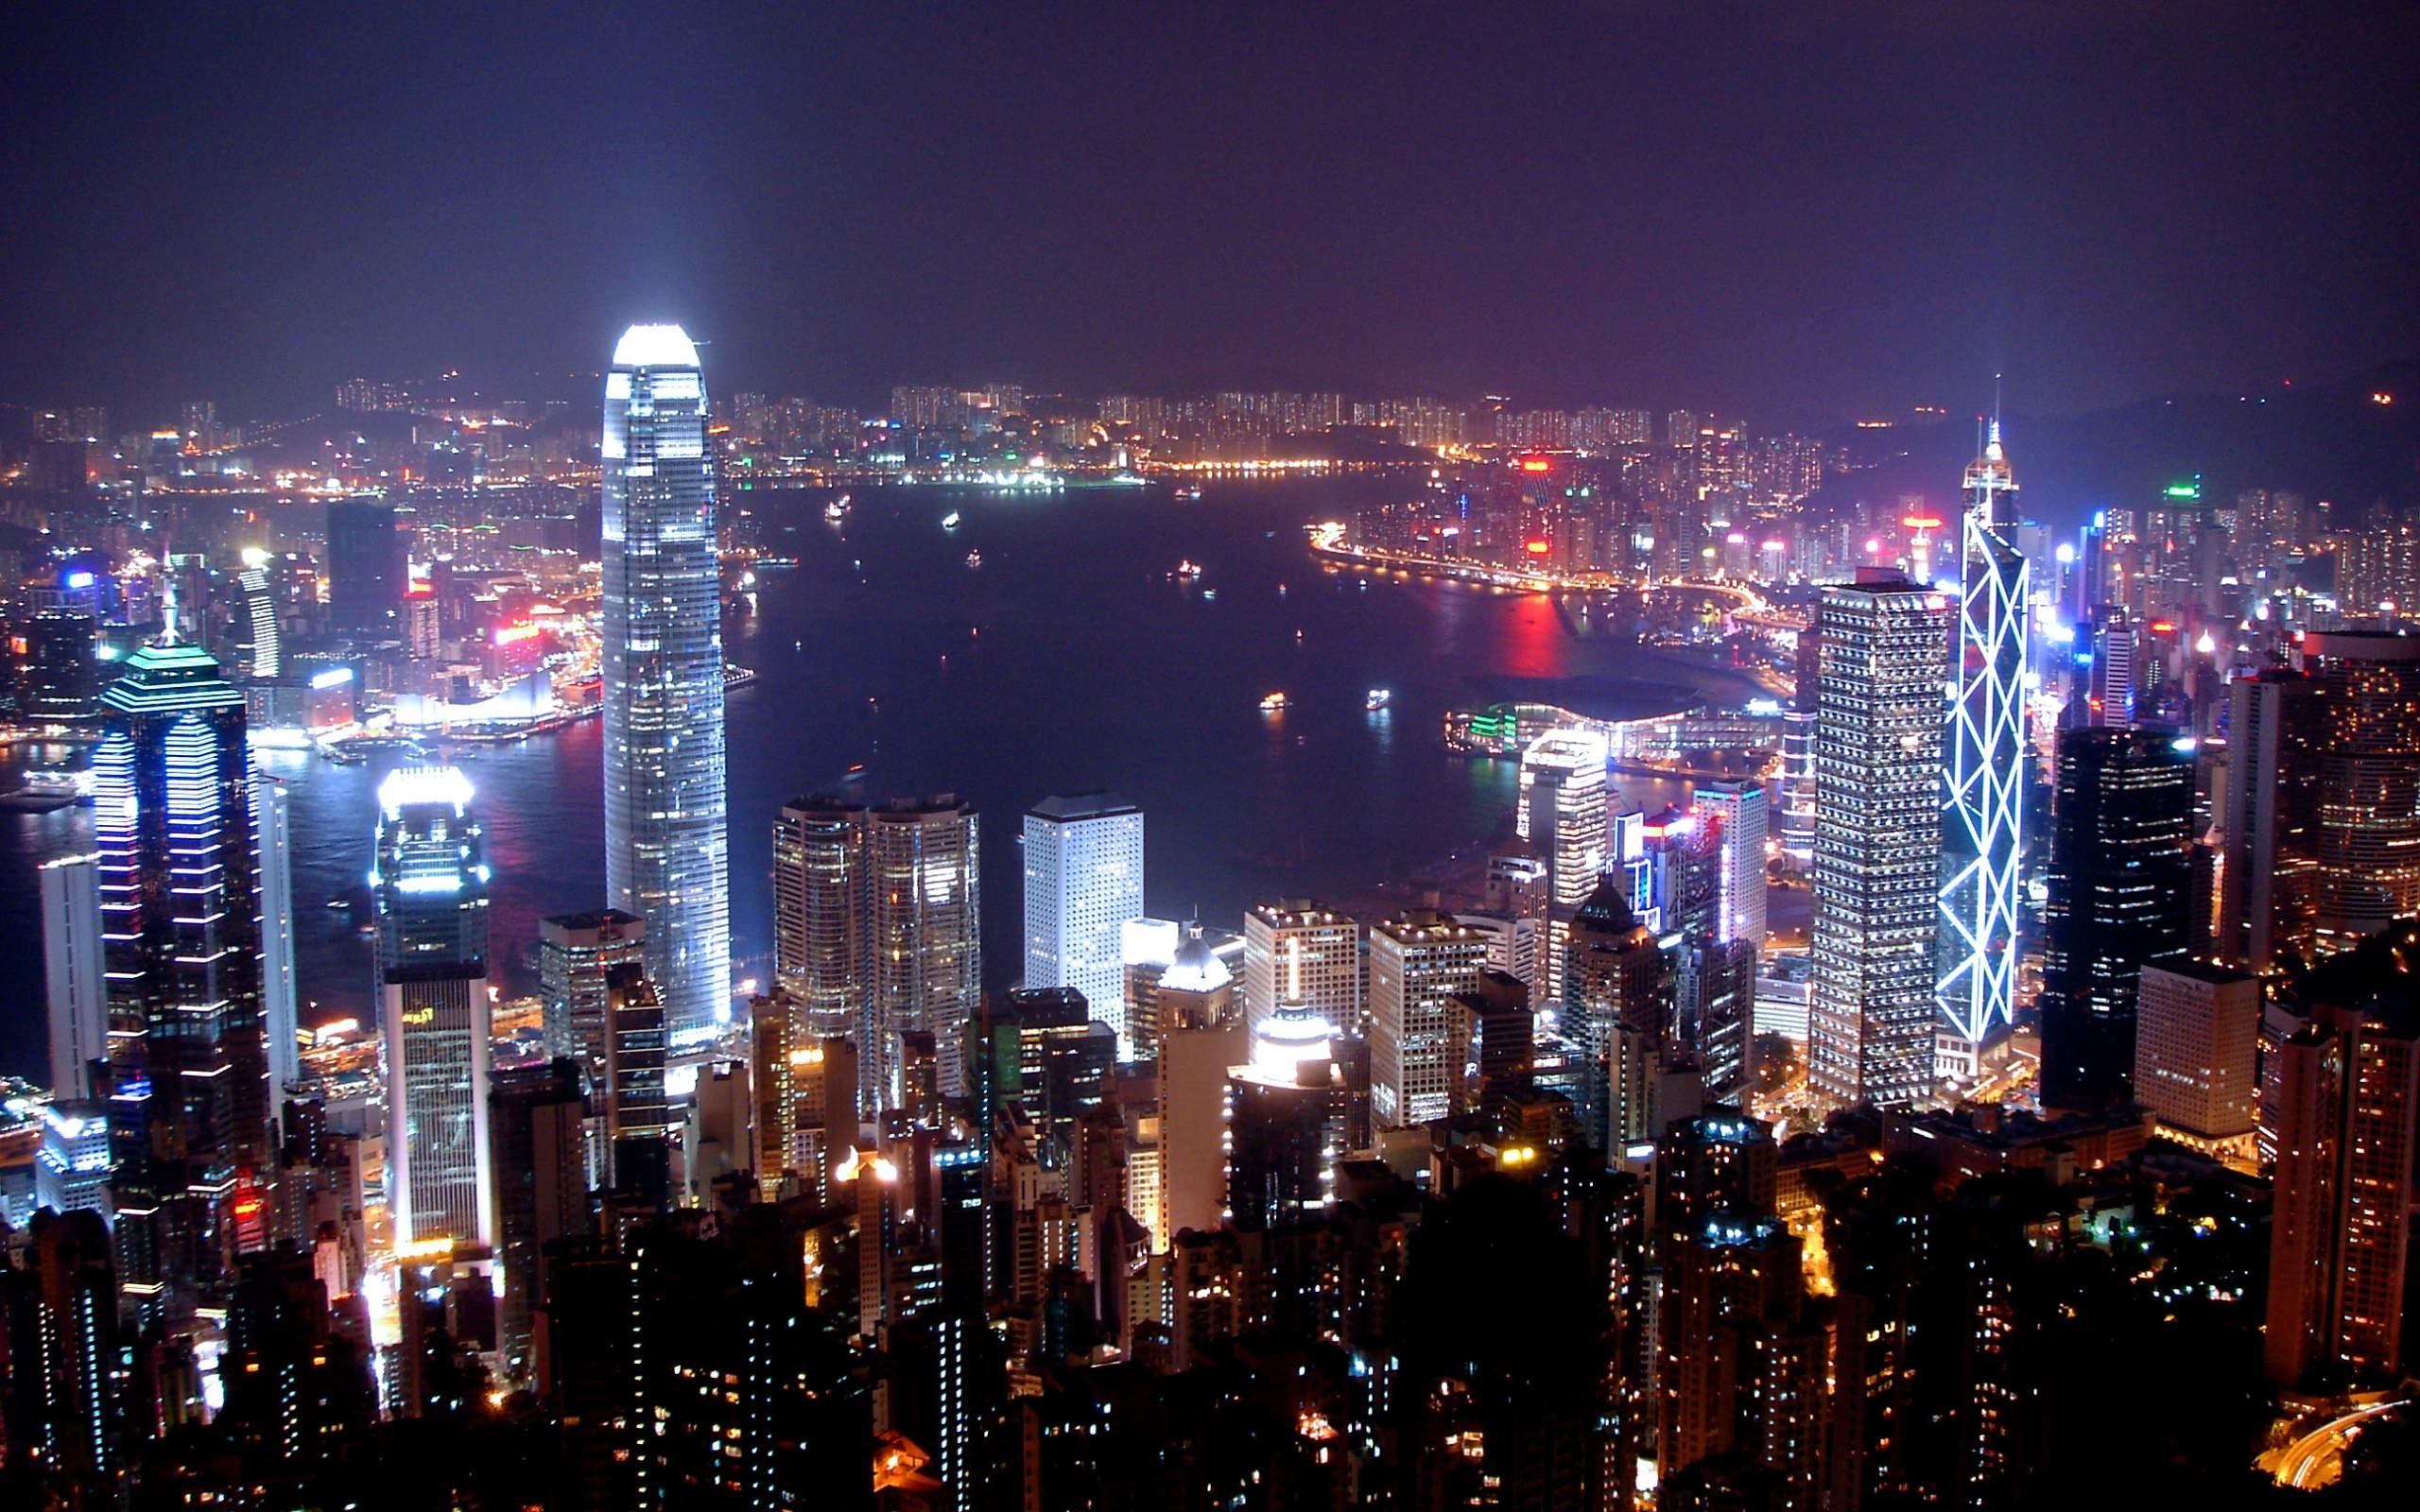 Manhattan New York City at Night